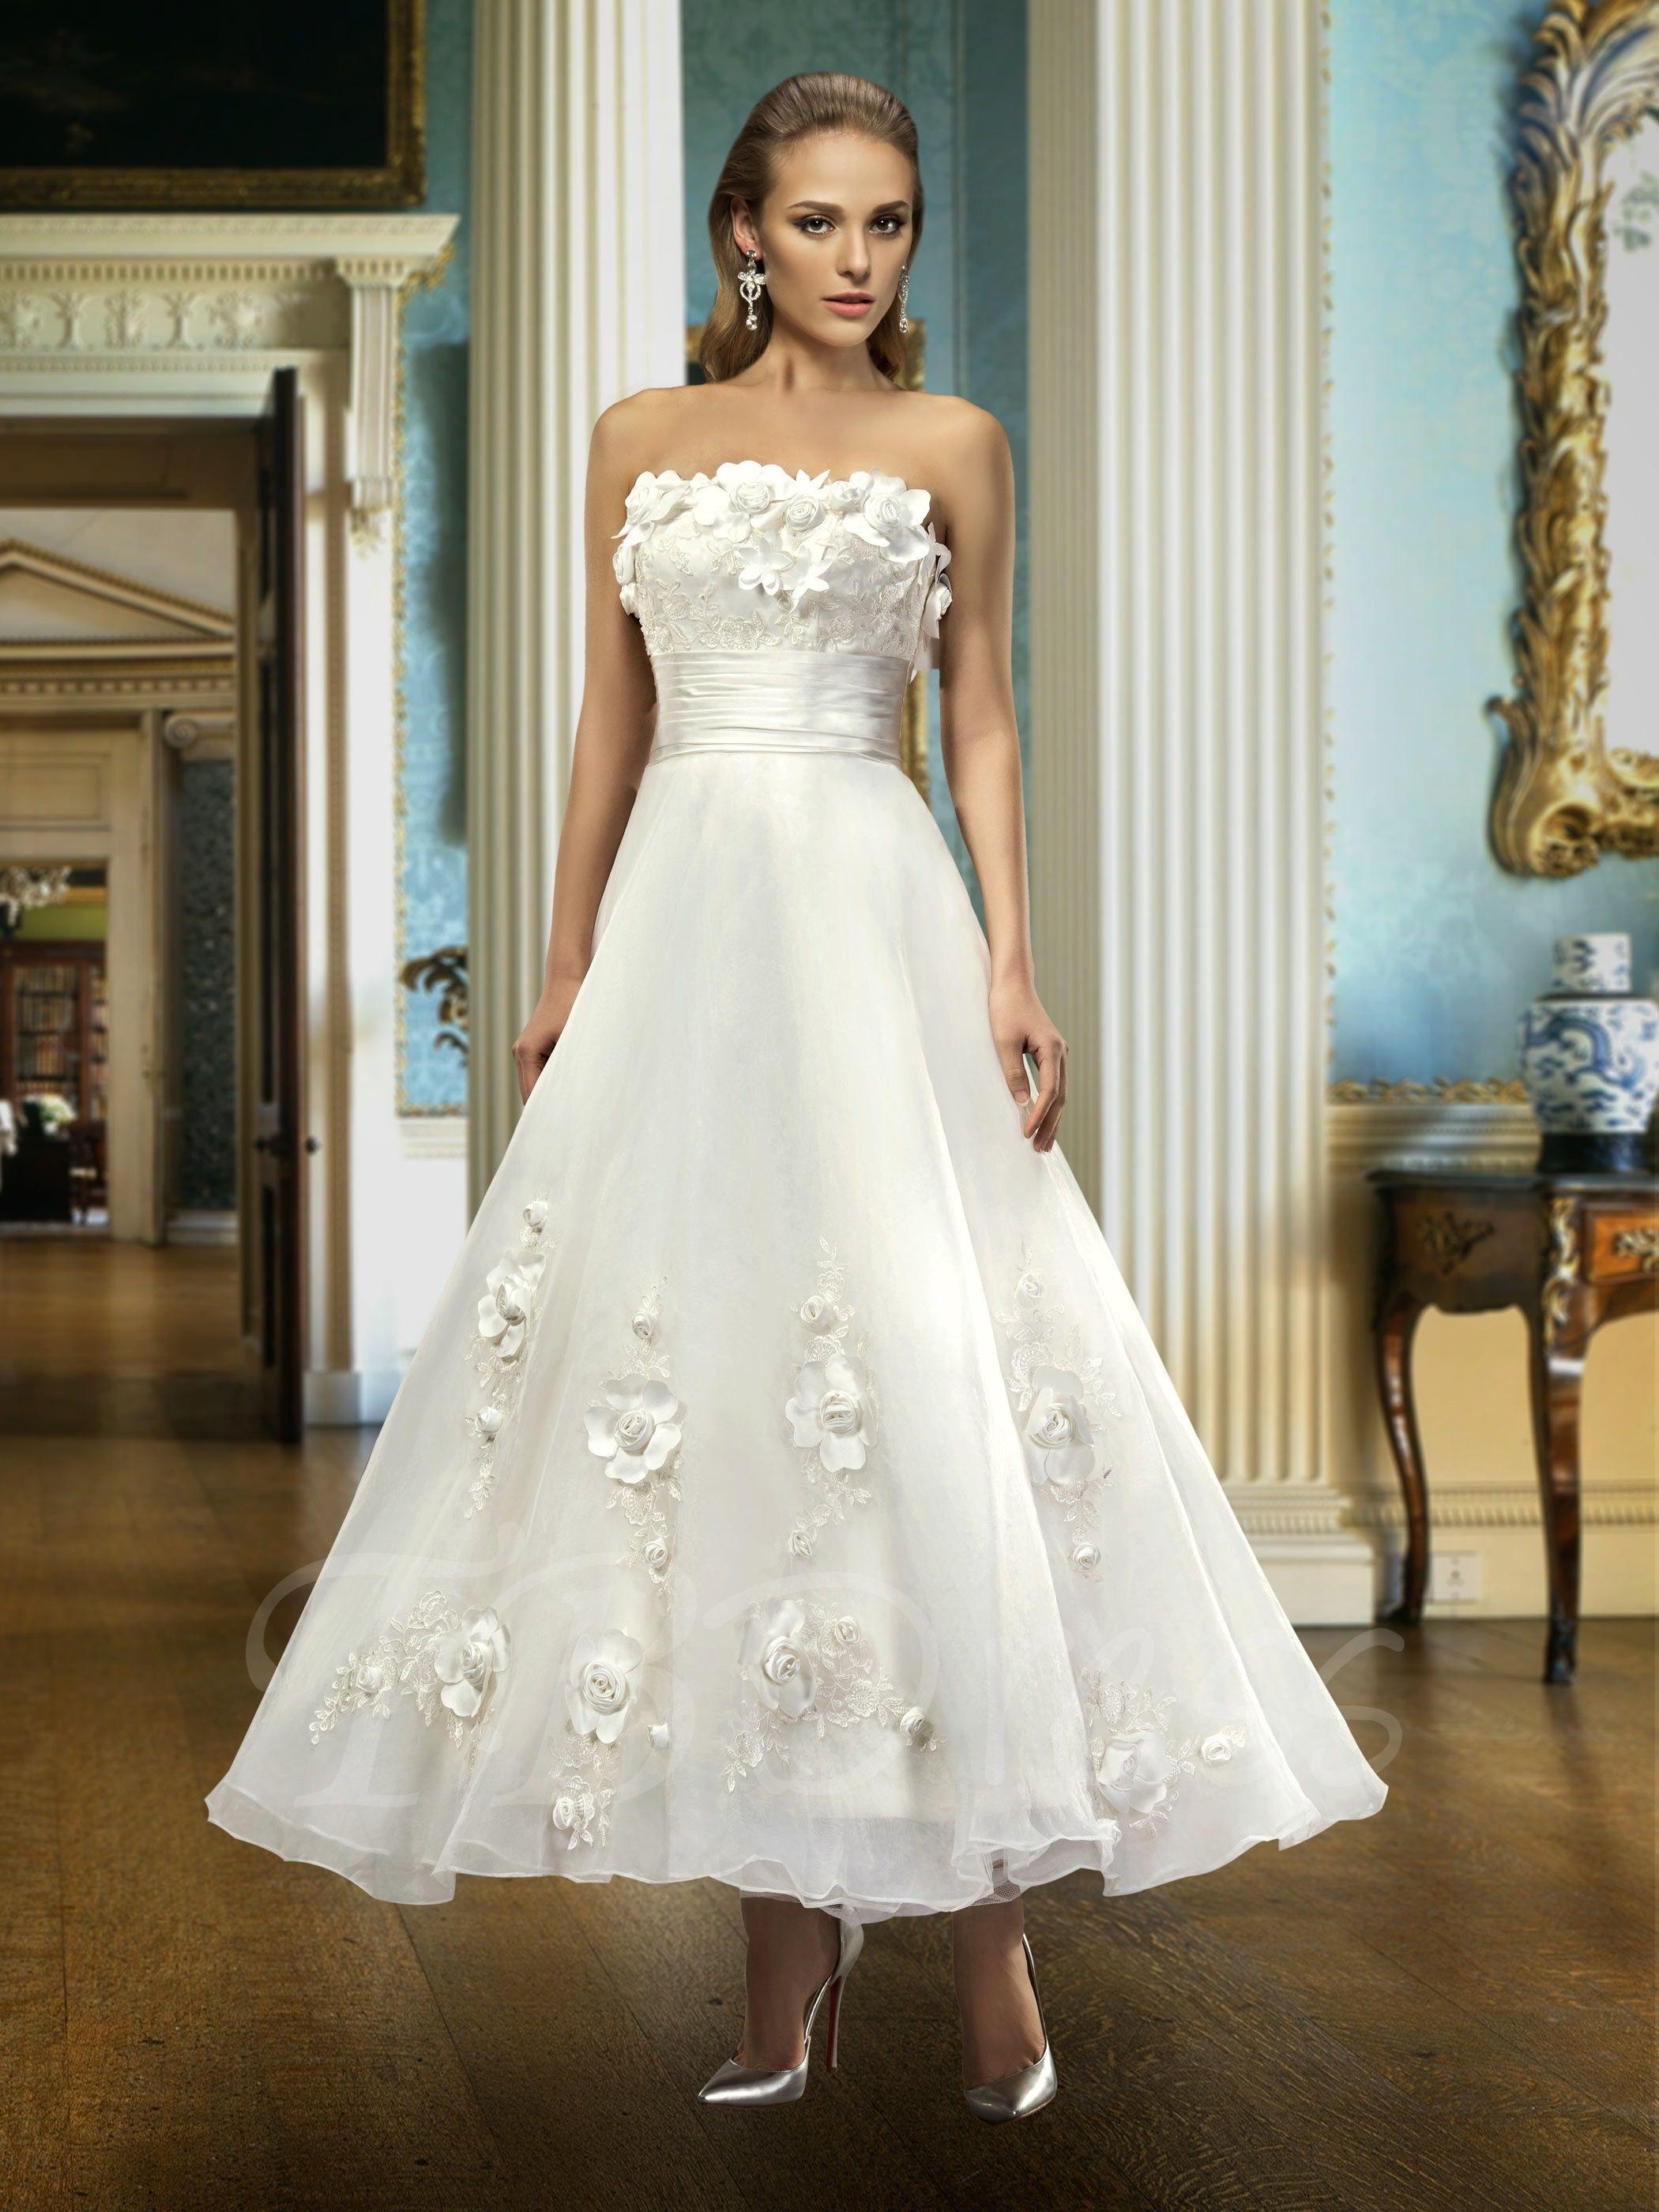 Al A Line Strapless Flowers Ankle Length Wedding Dress